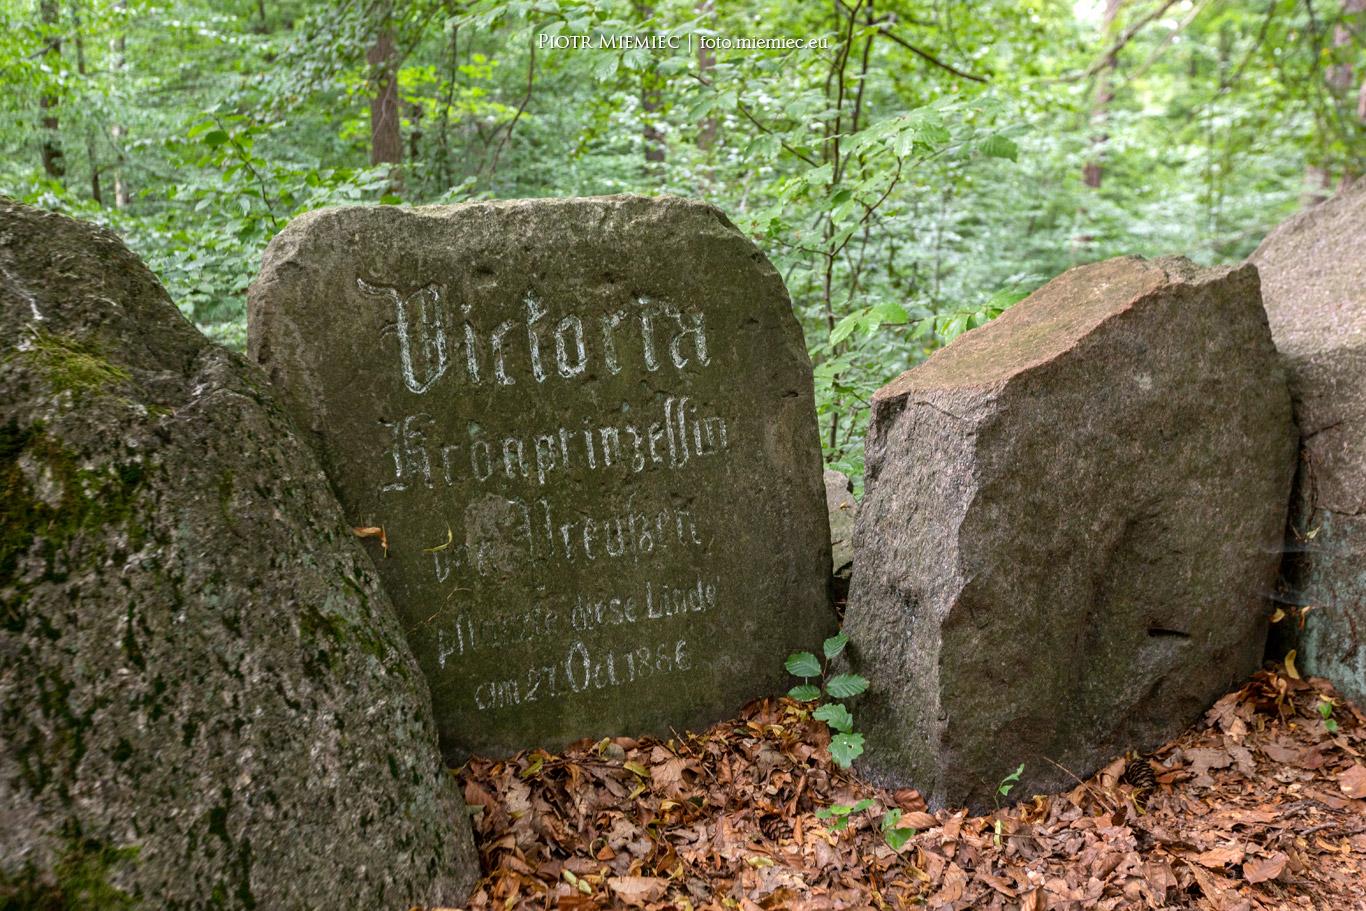 Rudzkie lasy – Góra Wiktorii